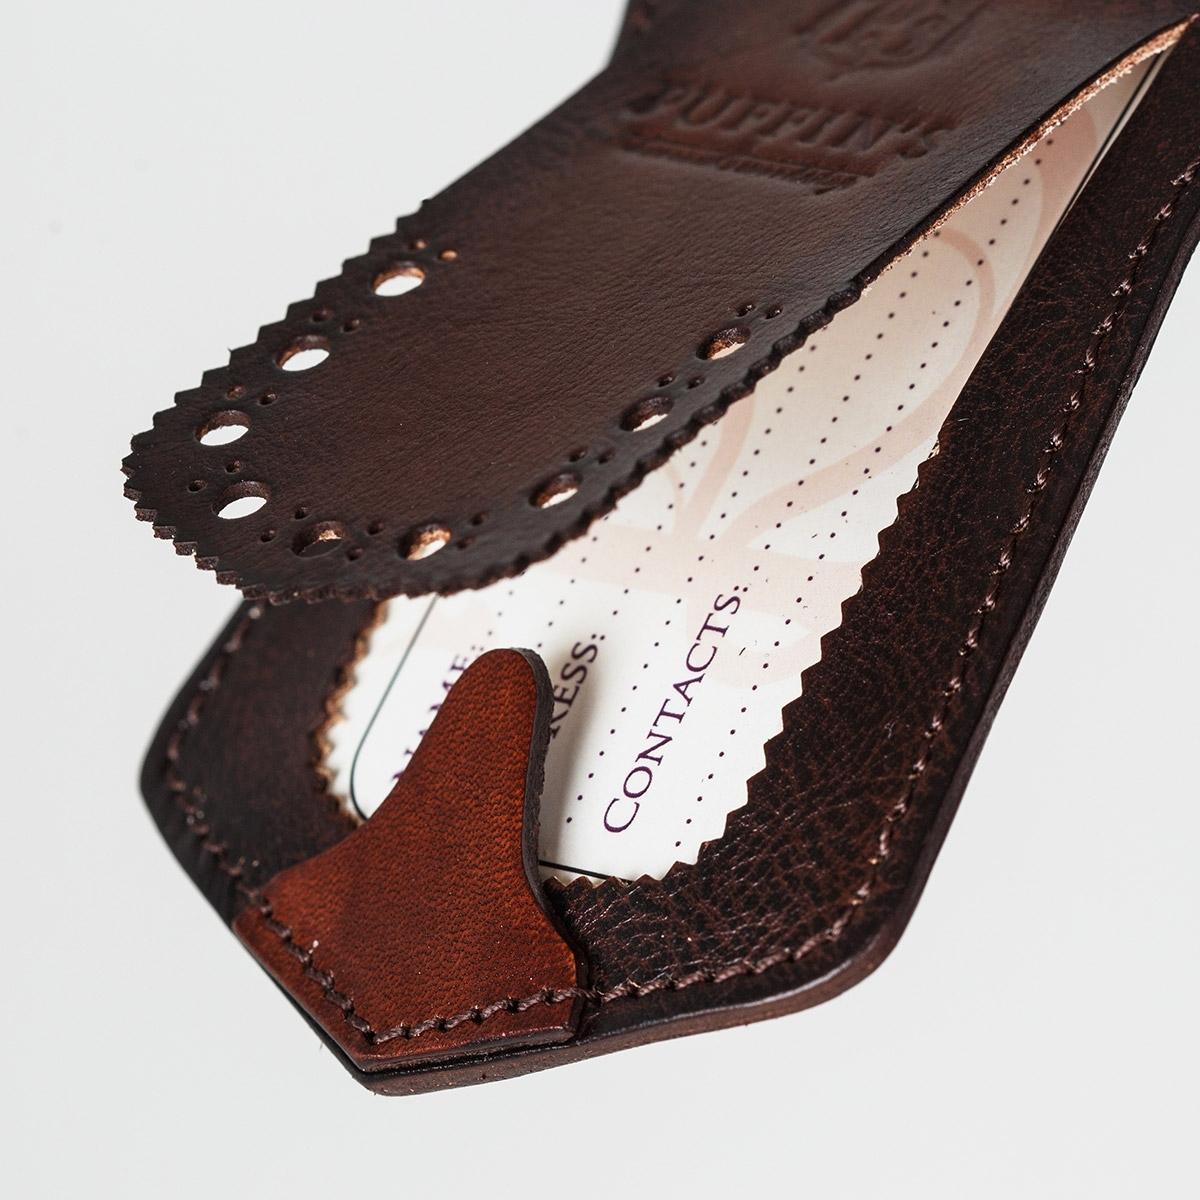 Luggage tag TAVARUA personalized with patina chestnut